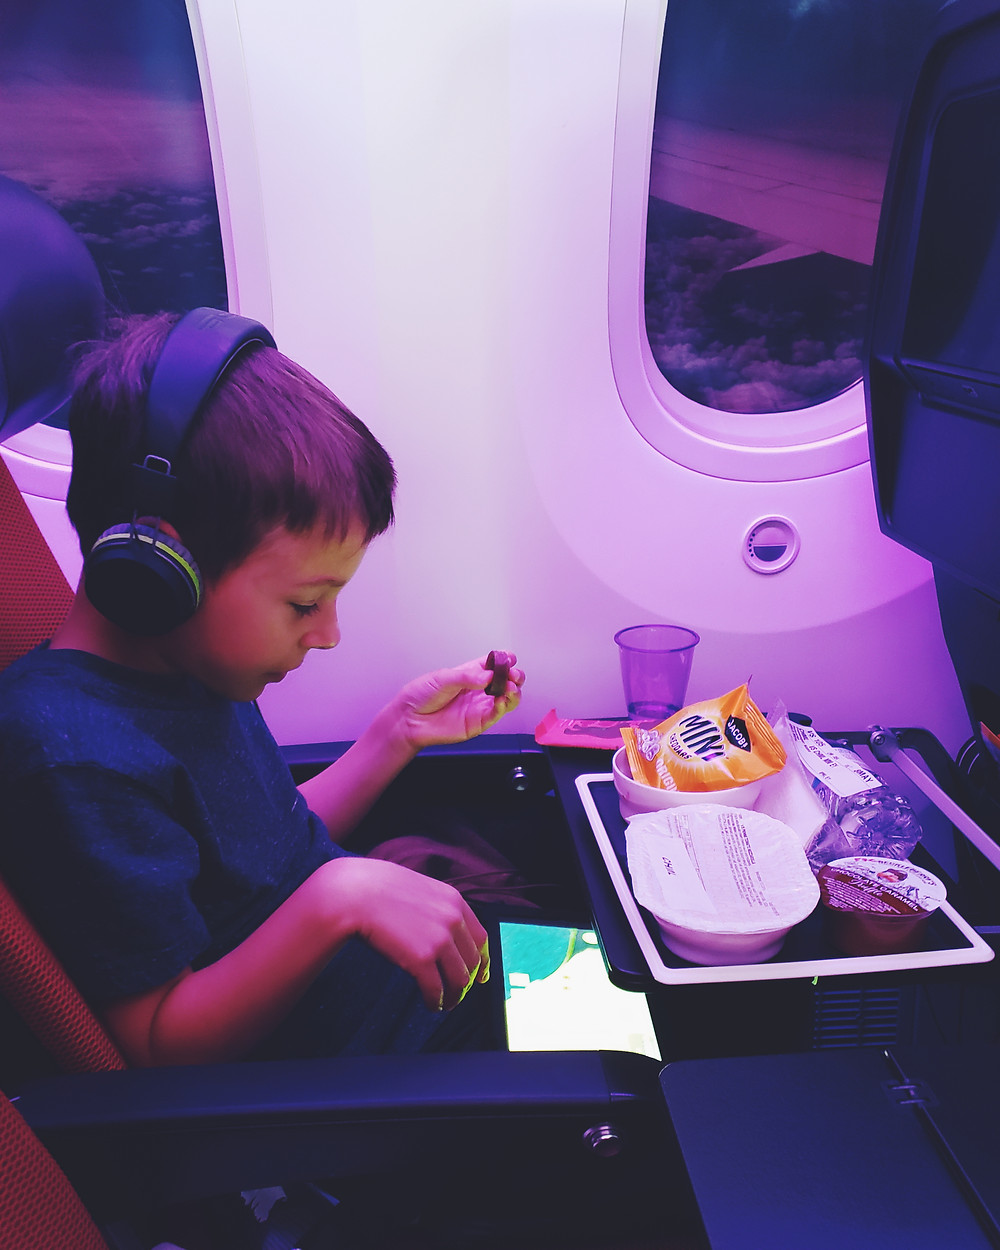 Virgin Atlantic Kids meal